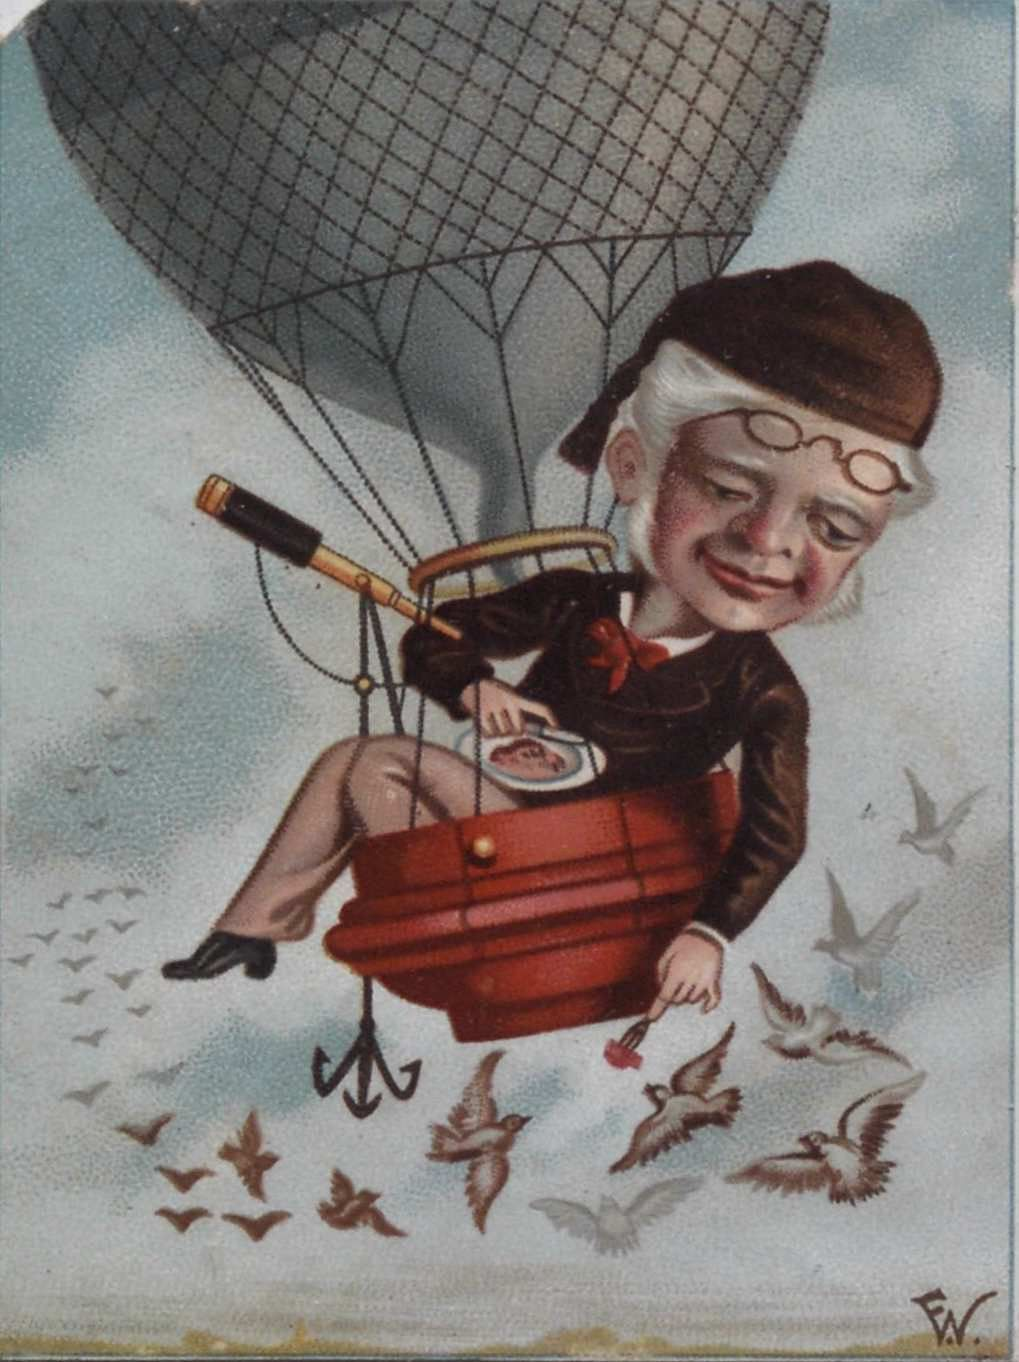 Untitled. Man in small balloon feeding birds